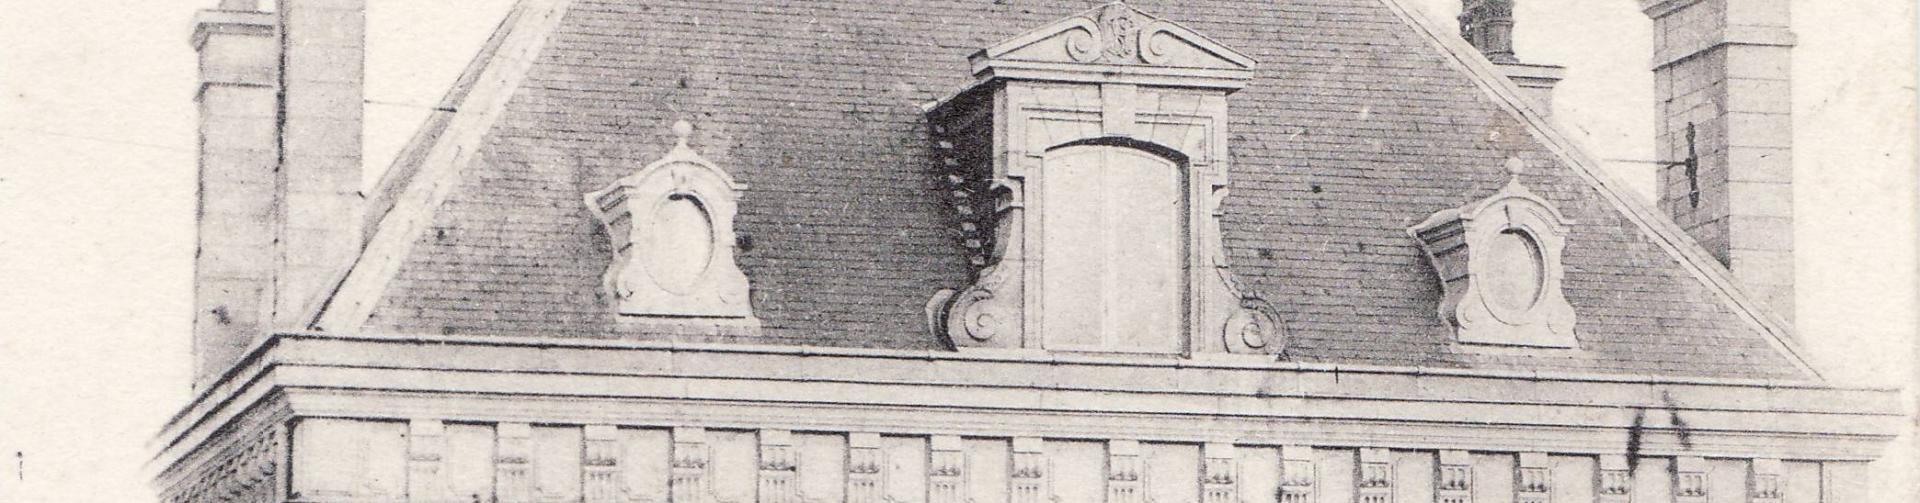 Manoir detail lucarnes